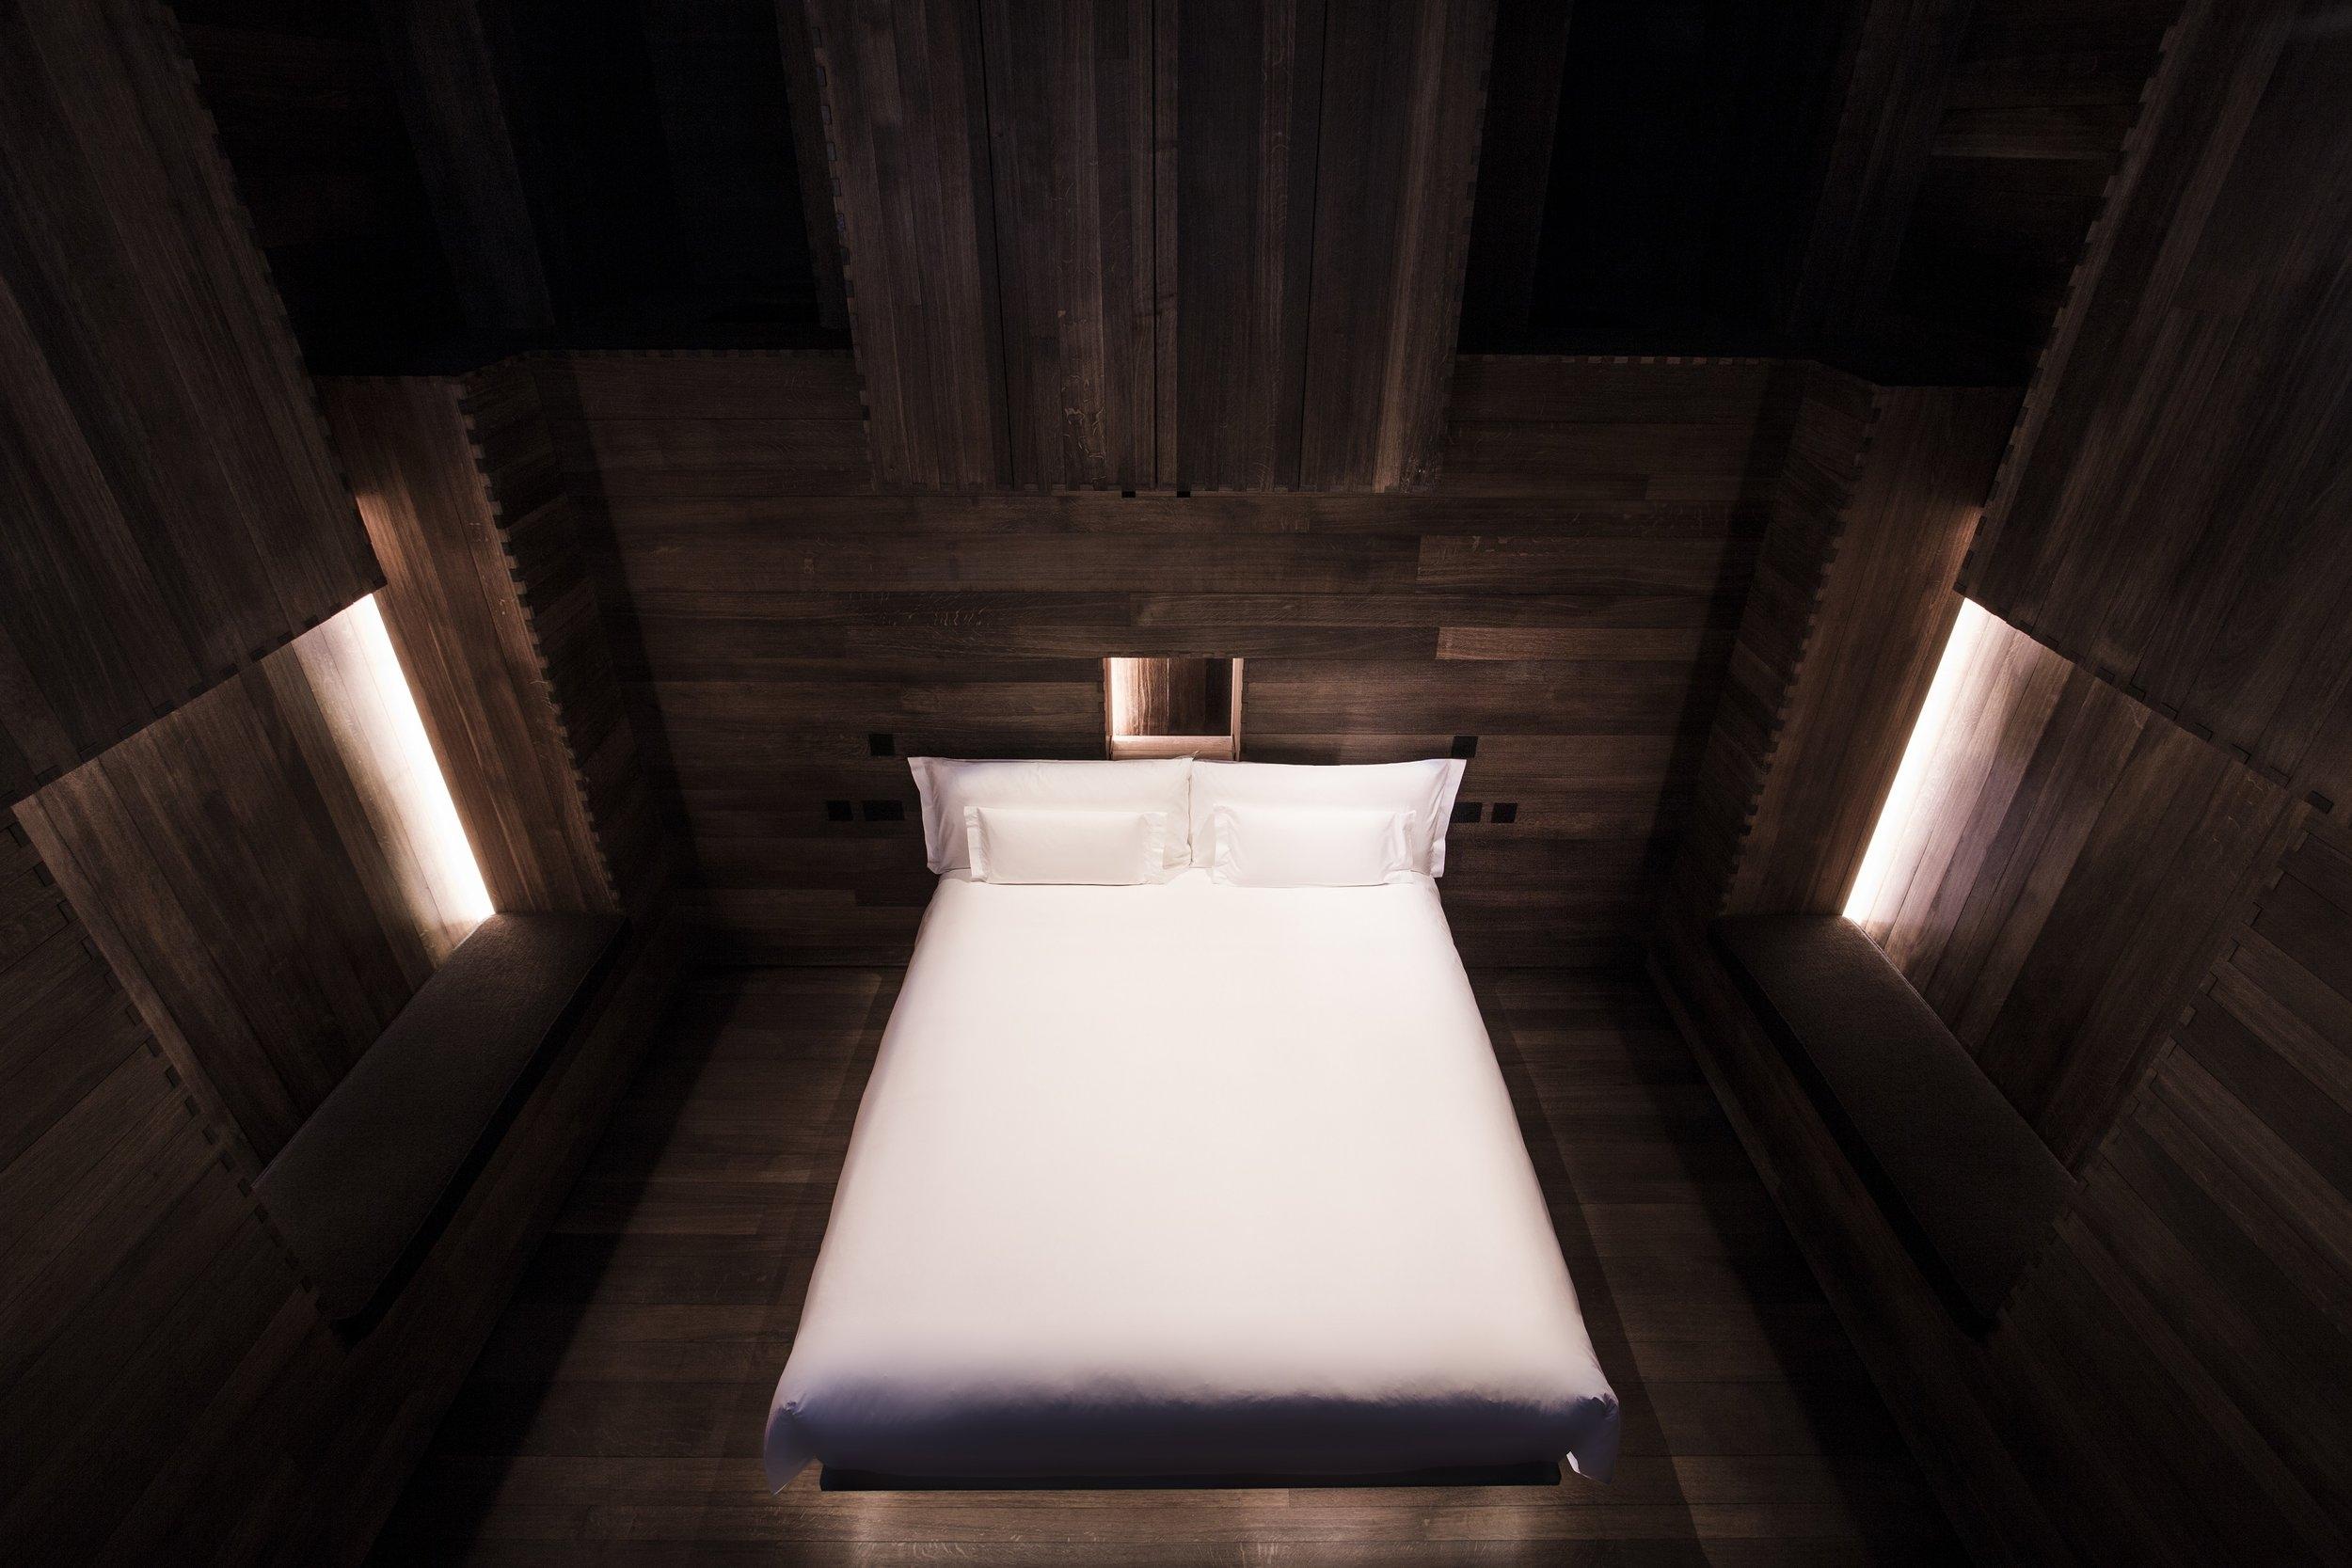 Beaumont_Gormley_ROOM_bedroom_Landscape_GramRoad_MR.jpg